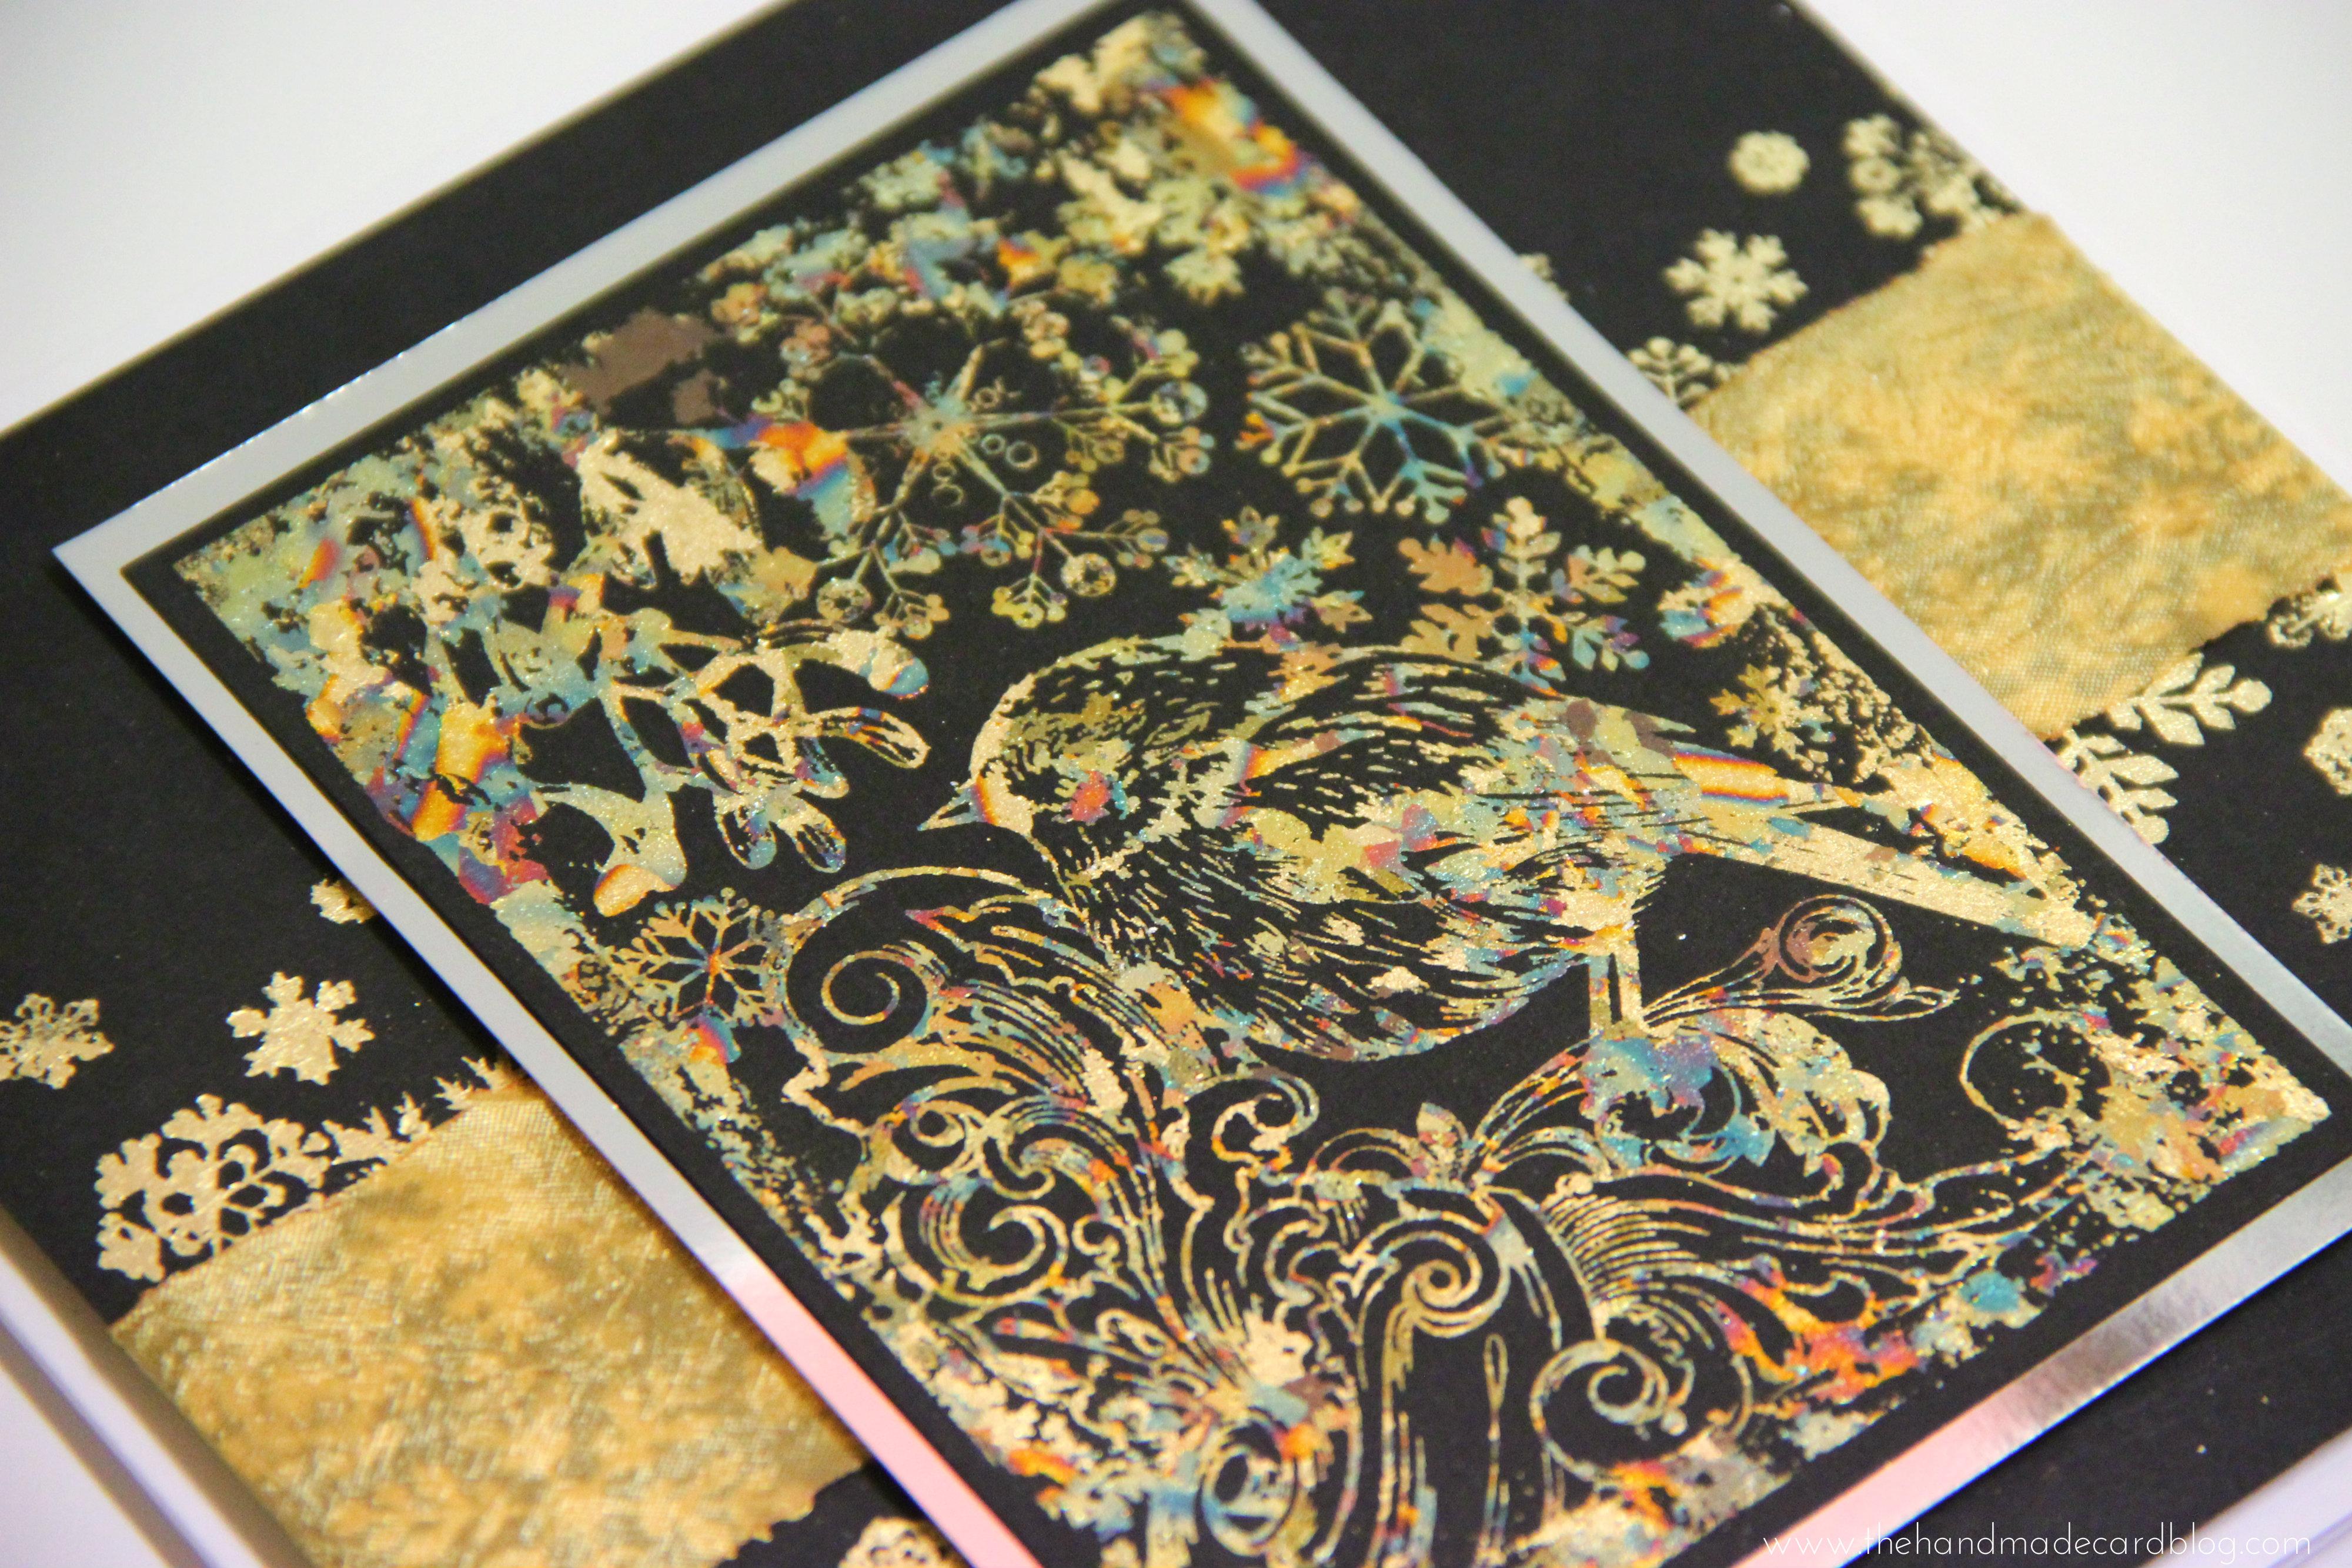 Mixed media paper crafting merry christmas card - Handmade Cards The Handmade Card Blog